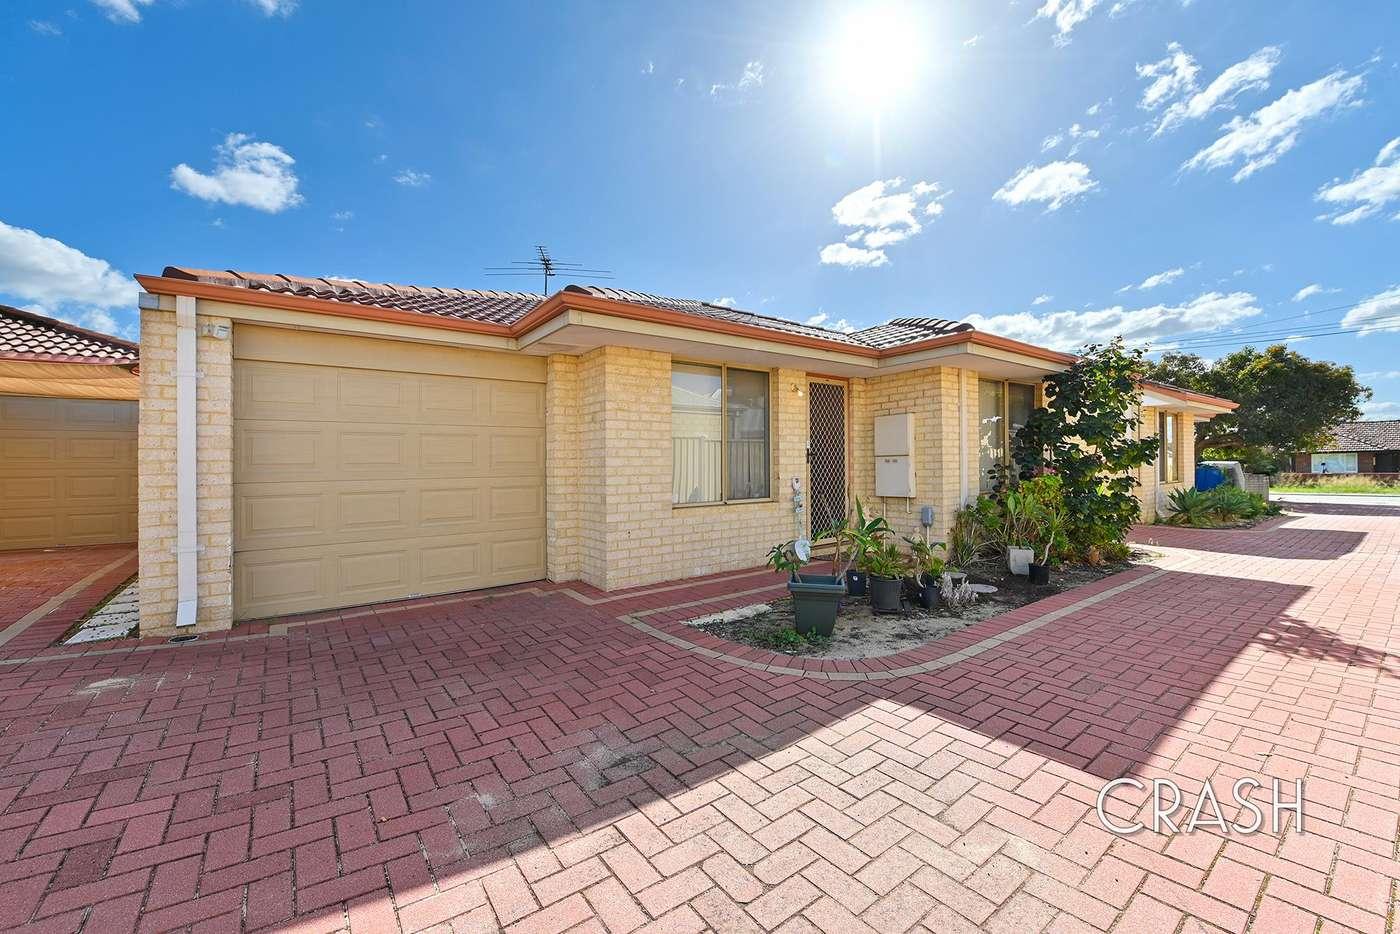 Main view of Homely villa listing, 2/24 Eastdene Circle, Nollamara WA 6061